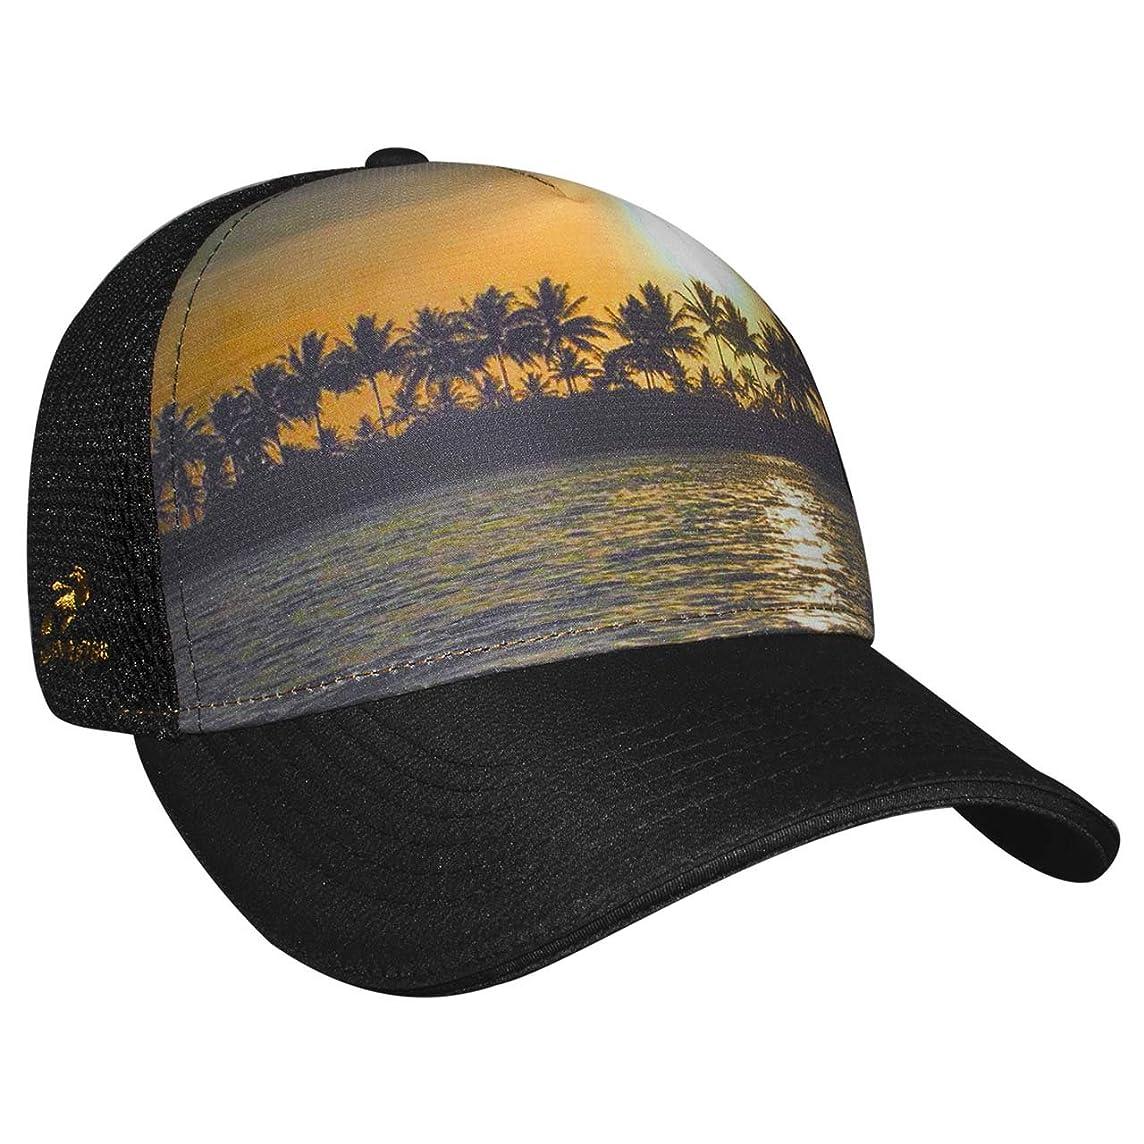 e93f76ff76a ... Headsweats Performance 5-Panel Trucker Hat